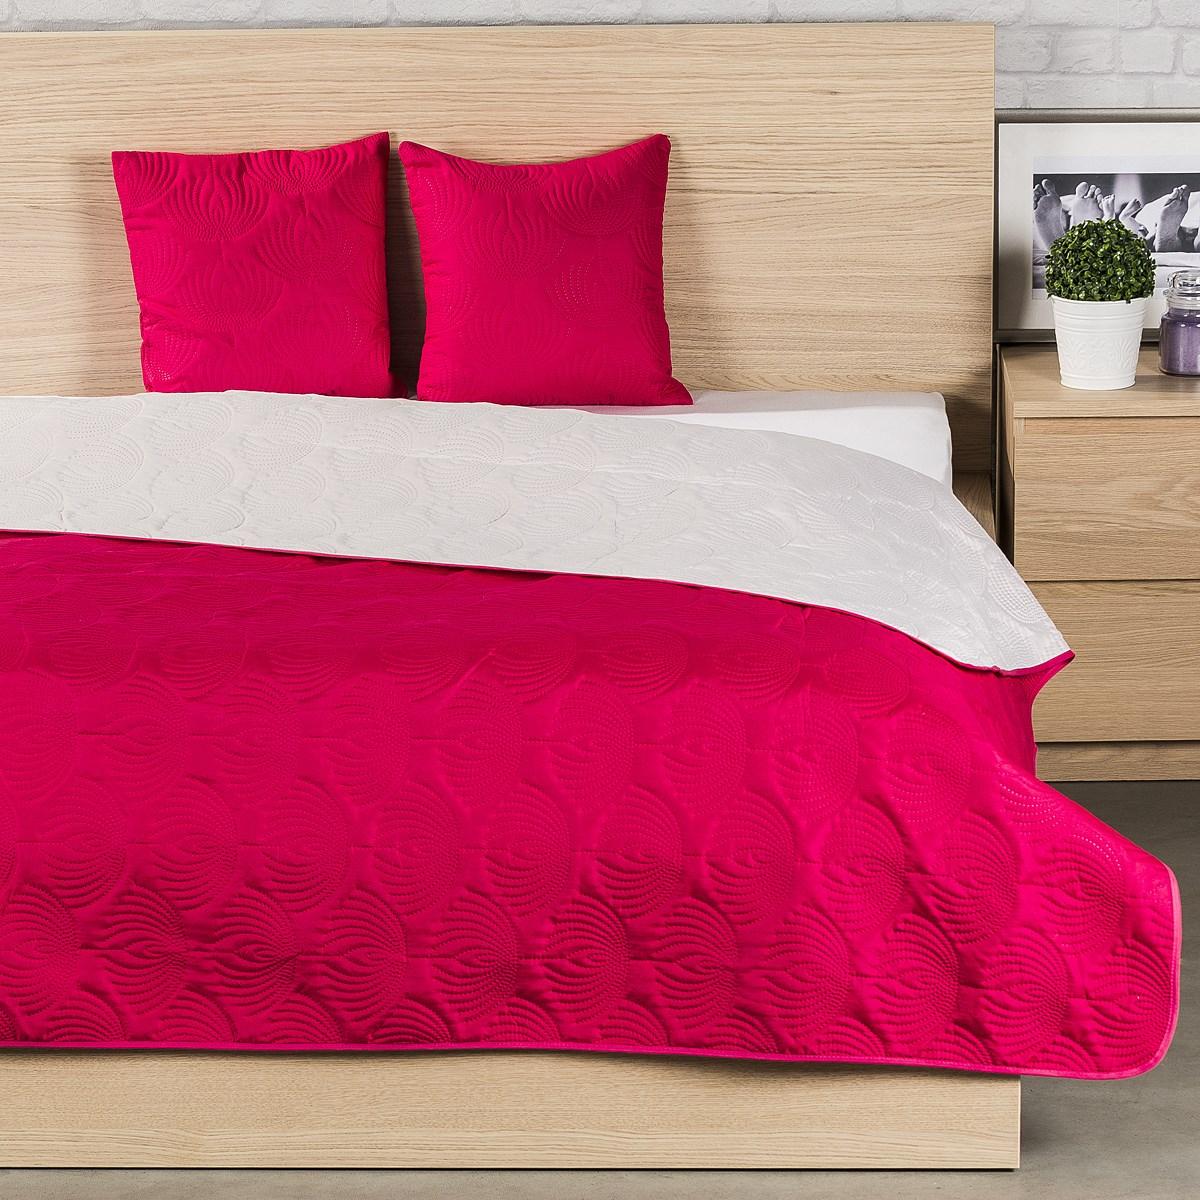 4home doubleface r zsasz n sz rke gytakar 240 x 220 cm 2x 40 x 40 cm lakberendez s. Black Bedroom Furniture Sets. Home Design Ideas